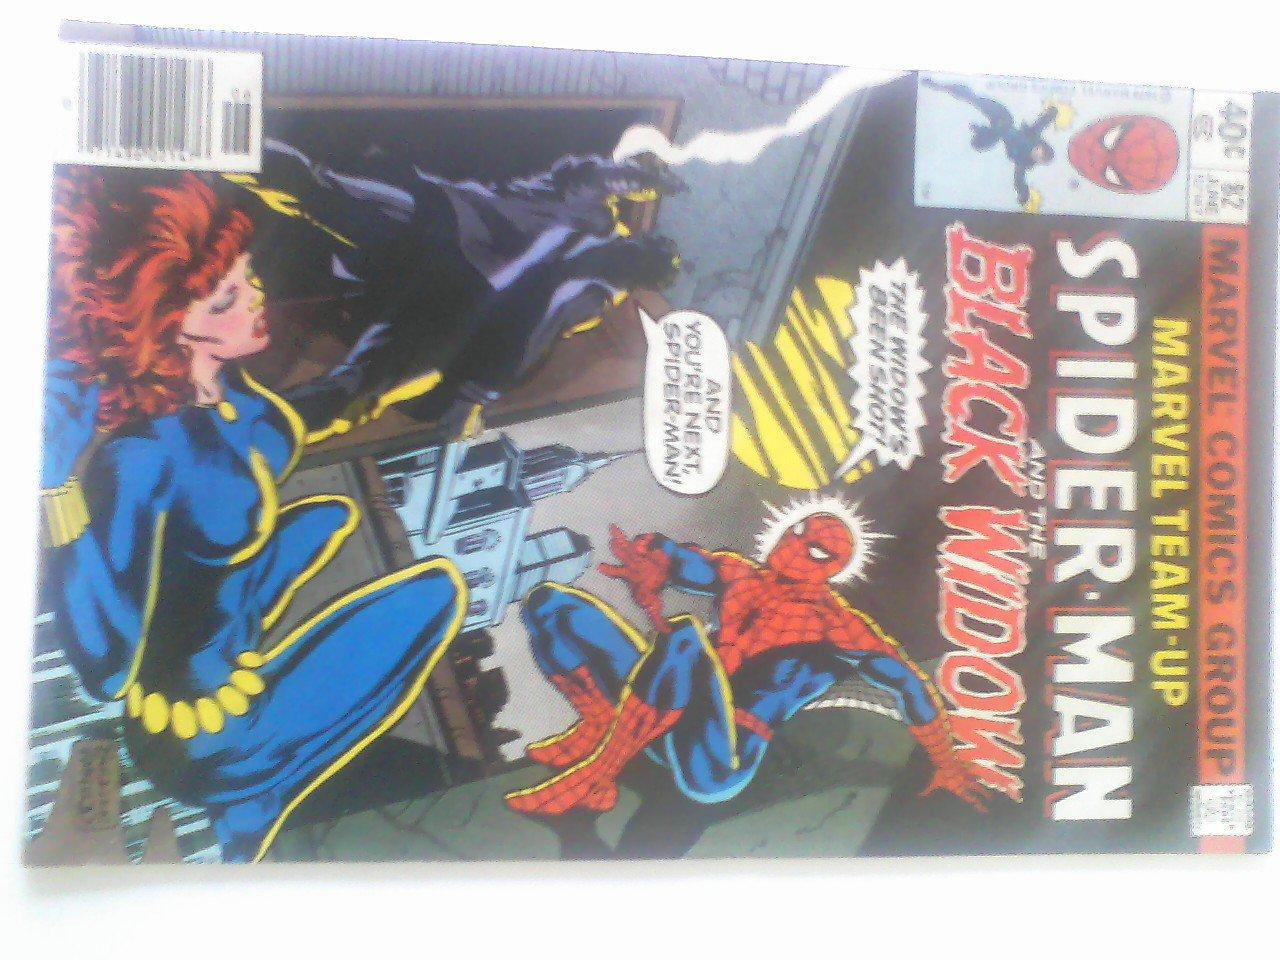 Marvel Team-Up #82, Spider-man/ The Black Widow Shot by Nick Fury #98